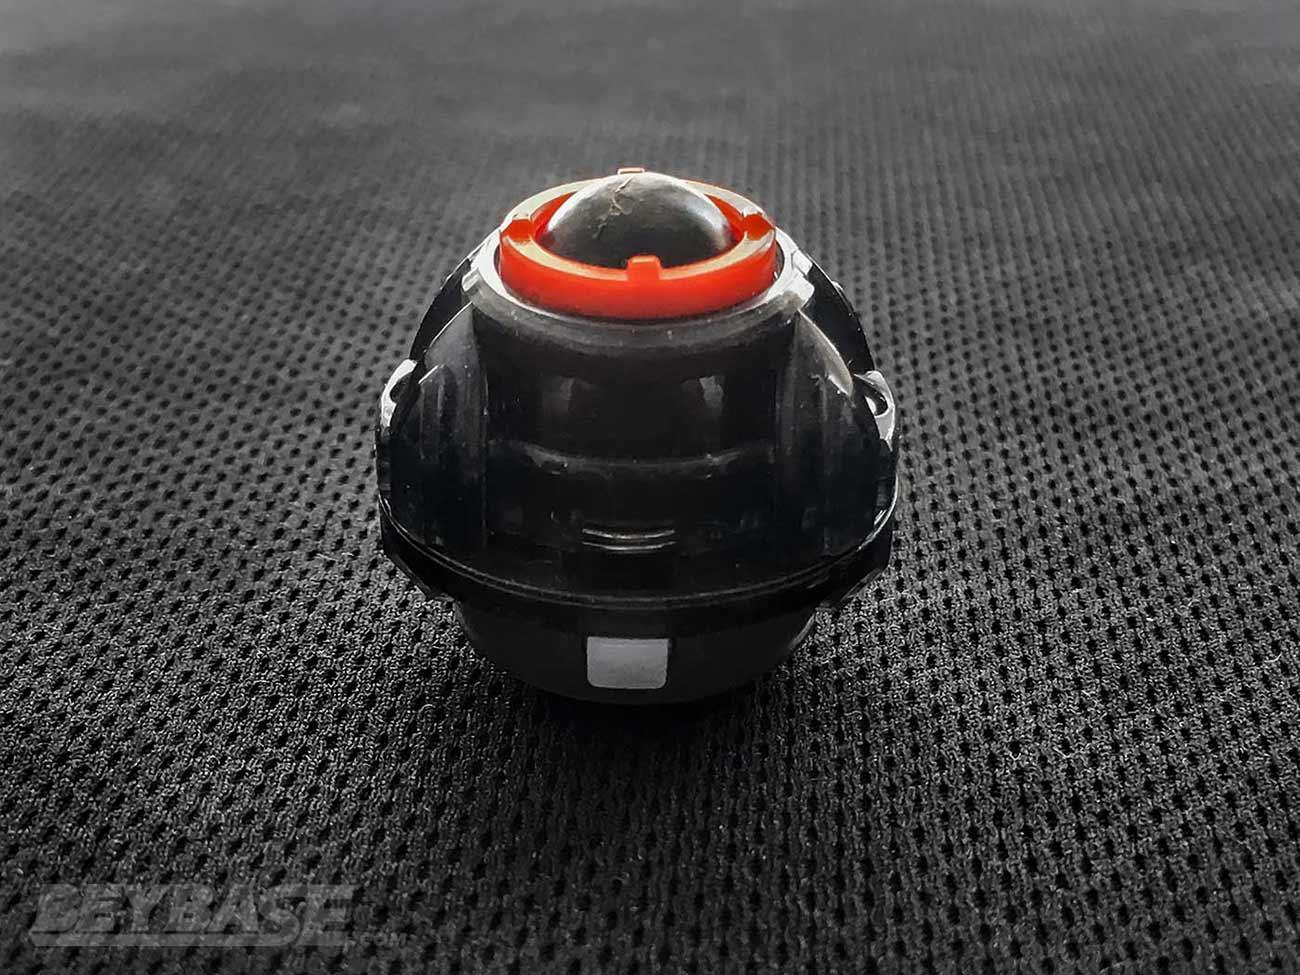 best beyblade burst stamina driver atomic red and black version